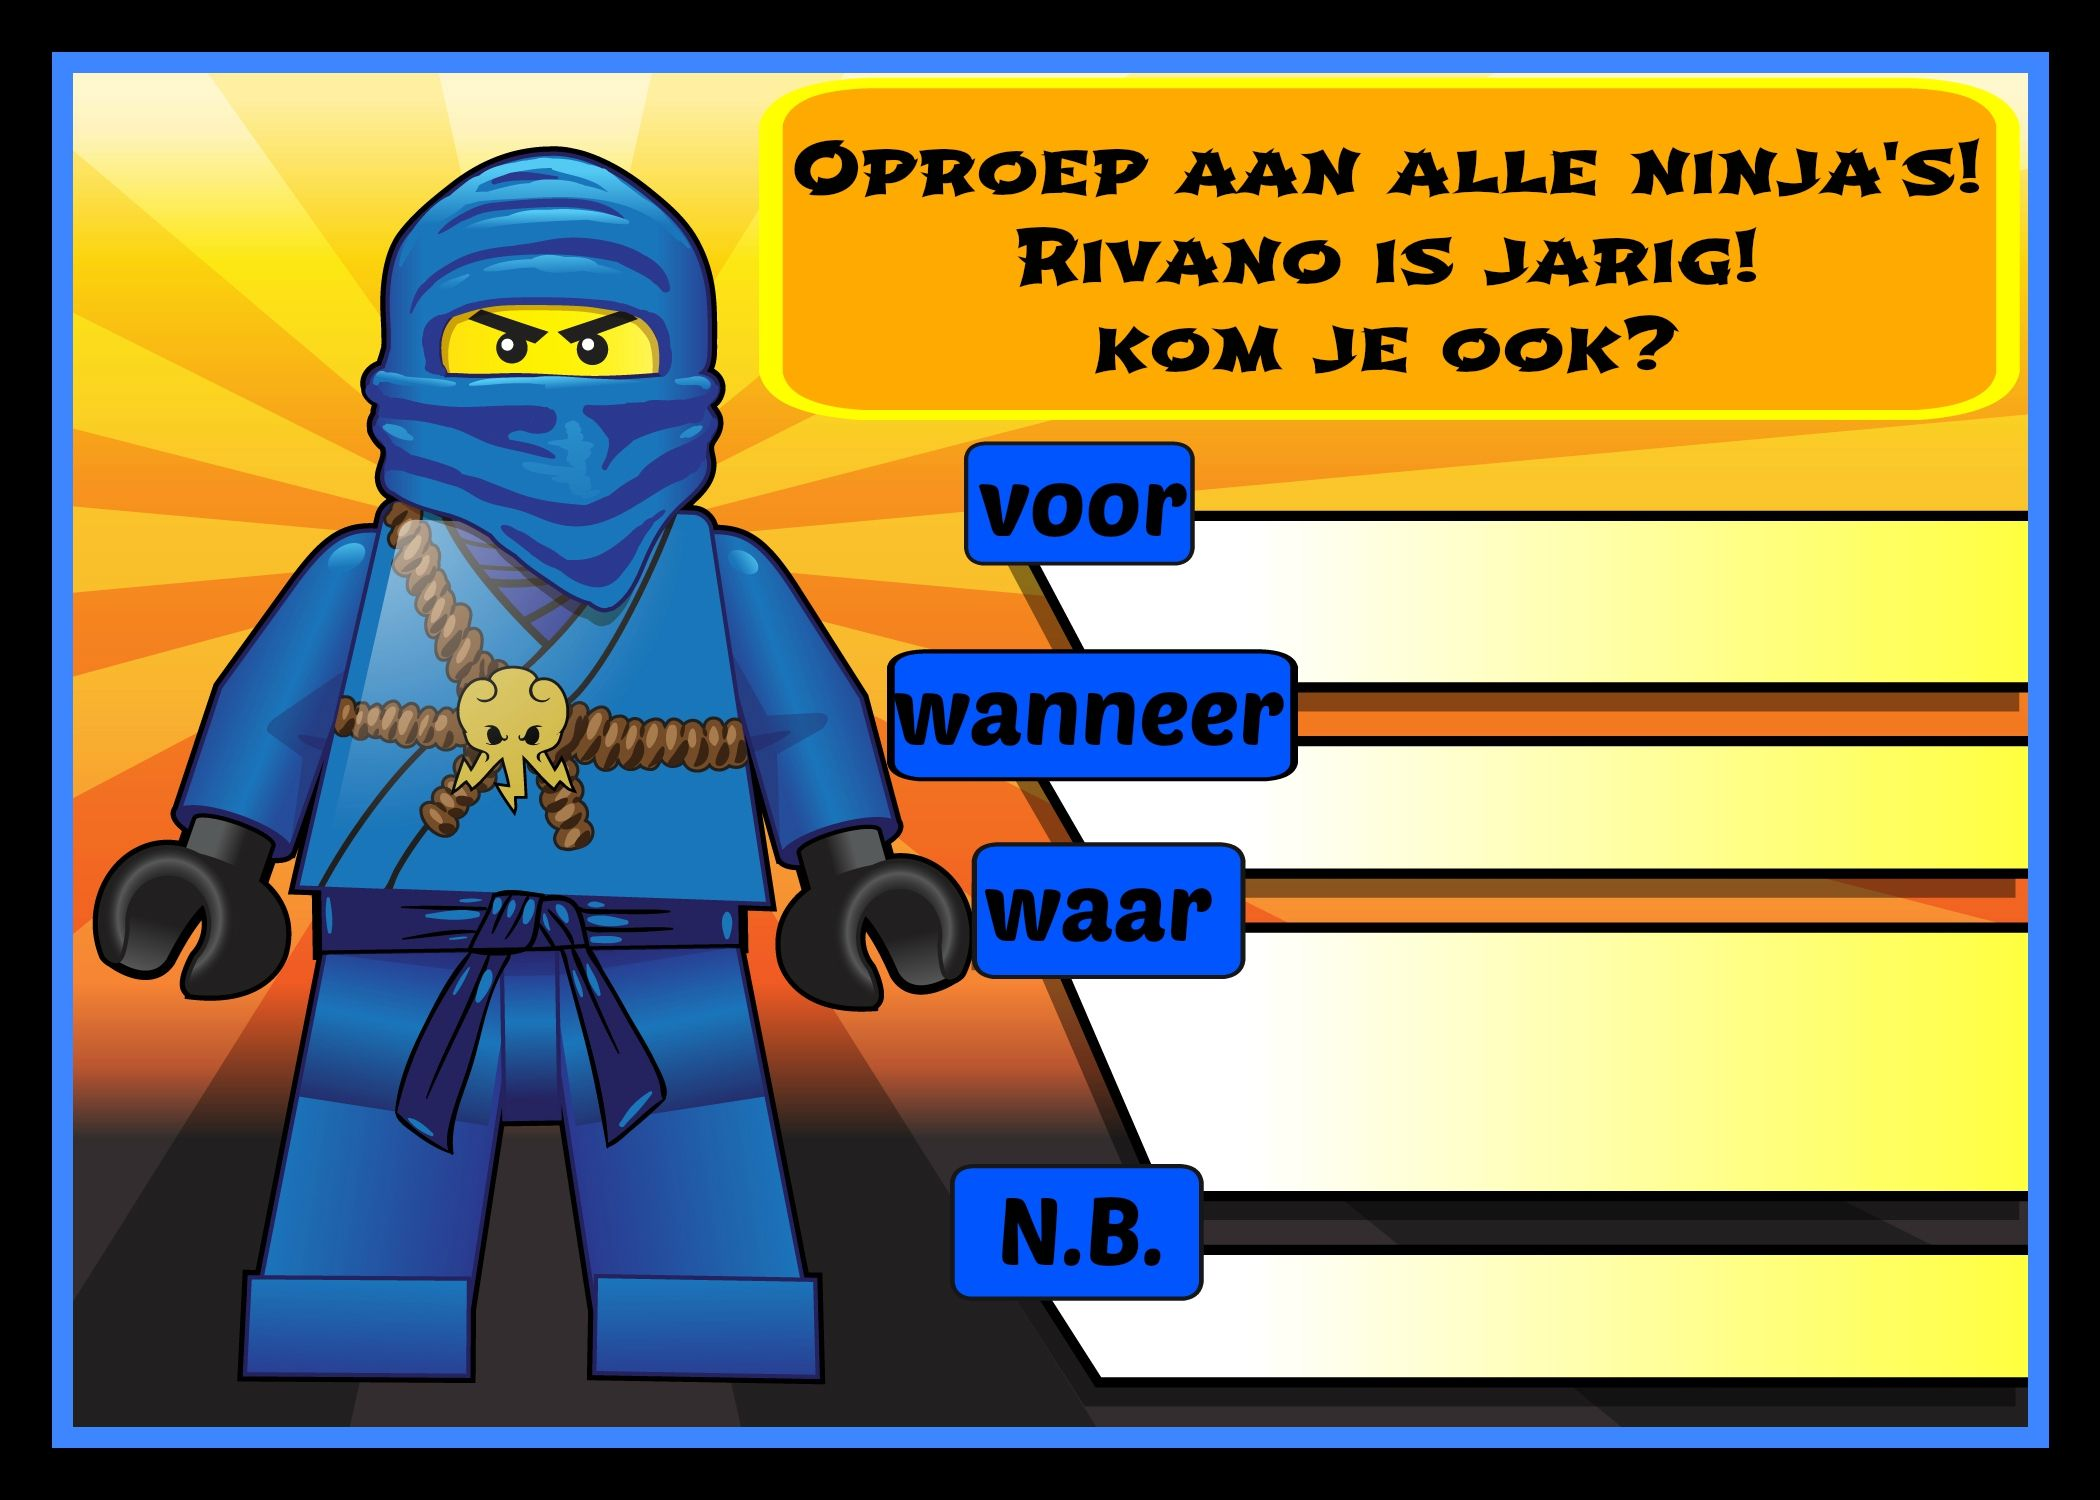 Lego Ninjago Verjaardag.Lego Ninjago Verjaardag Uitnodiging Kids Ideas Lego